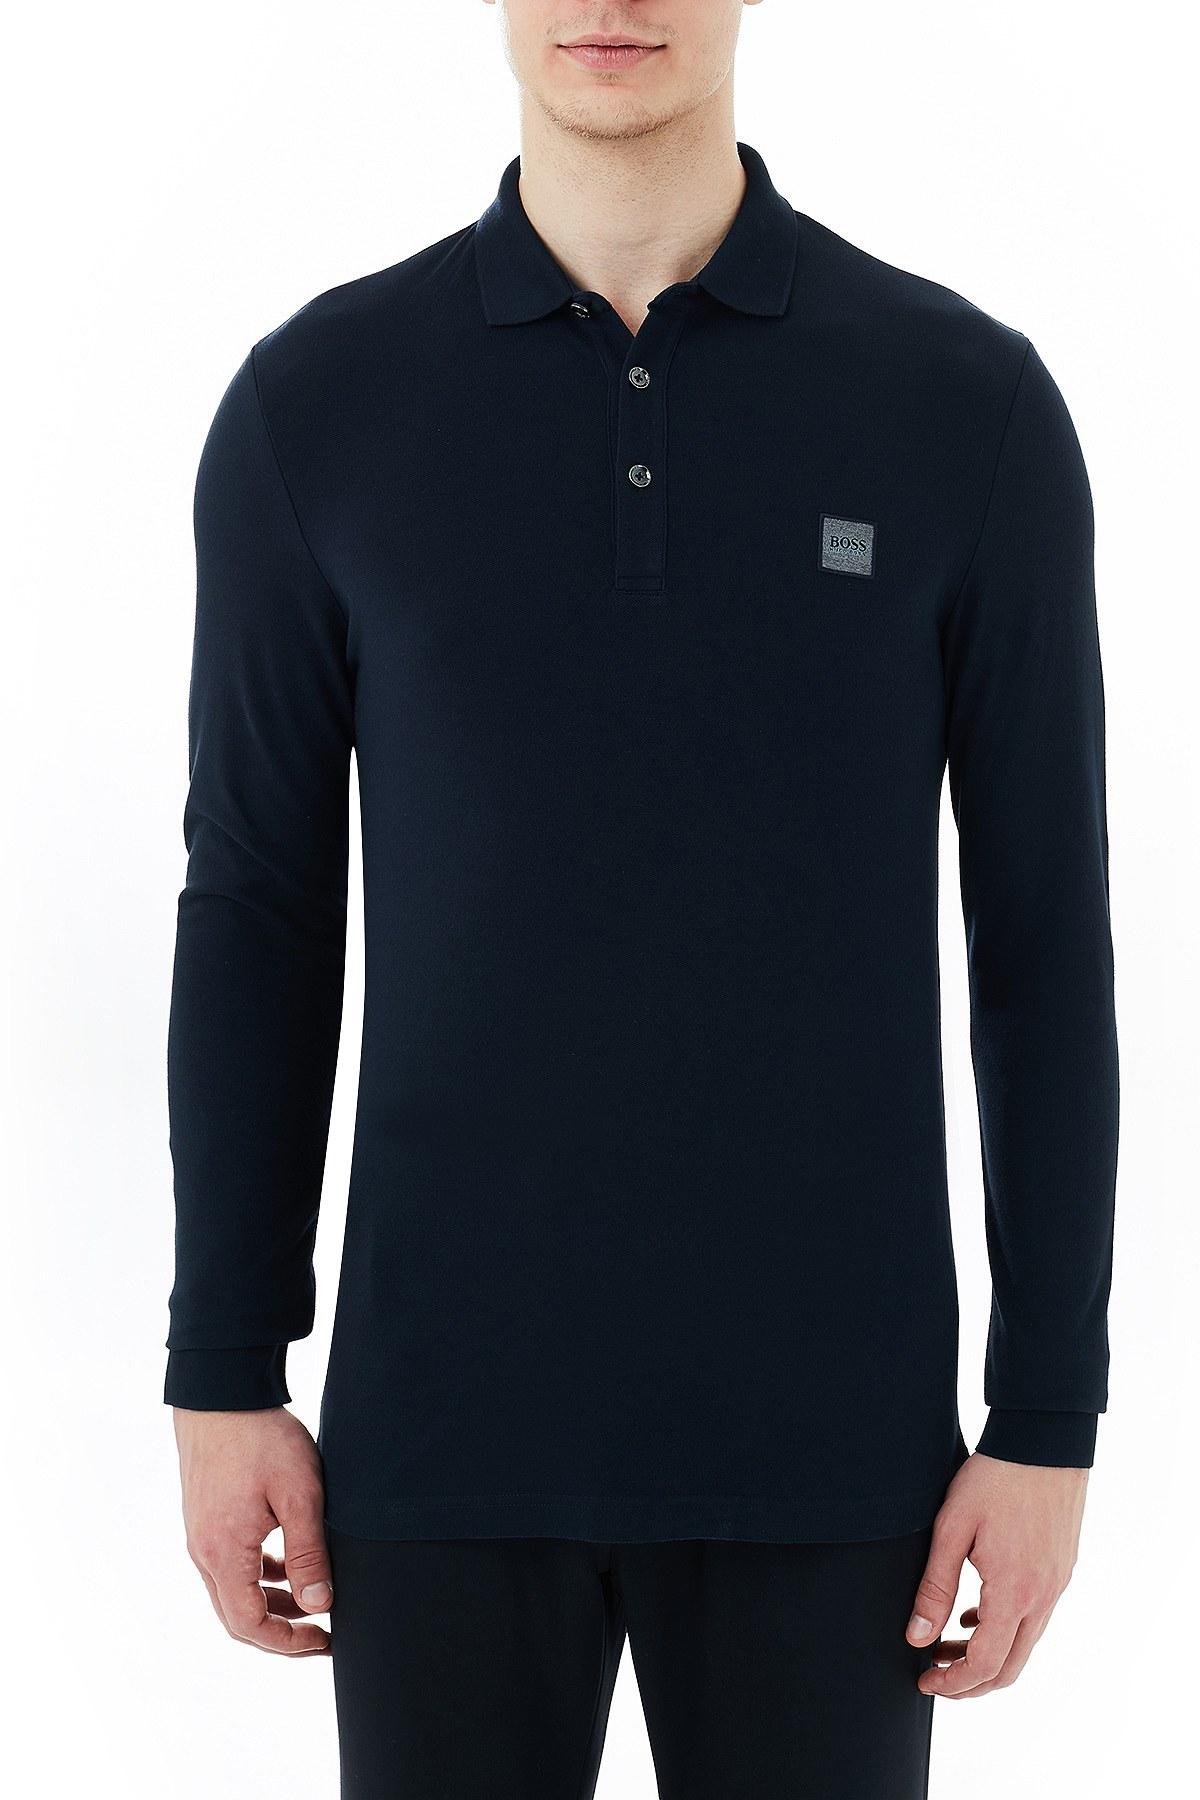 Hugo Boss Slim Fit Pamuklu Düğmeli T Shirt Erkek Polo 50387465 404 LACİVERT